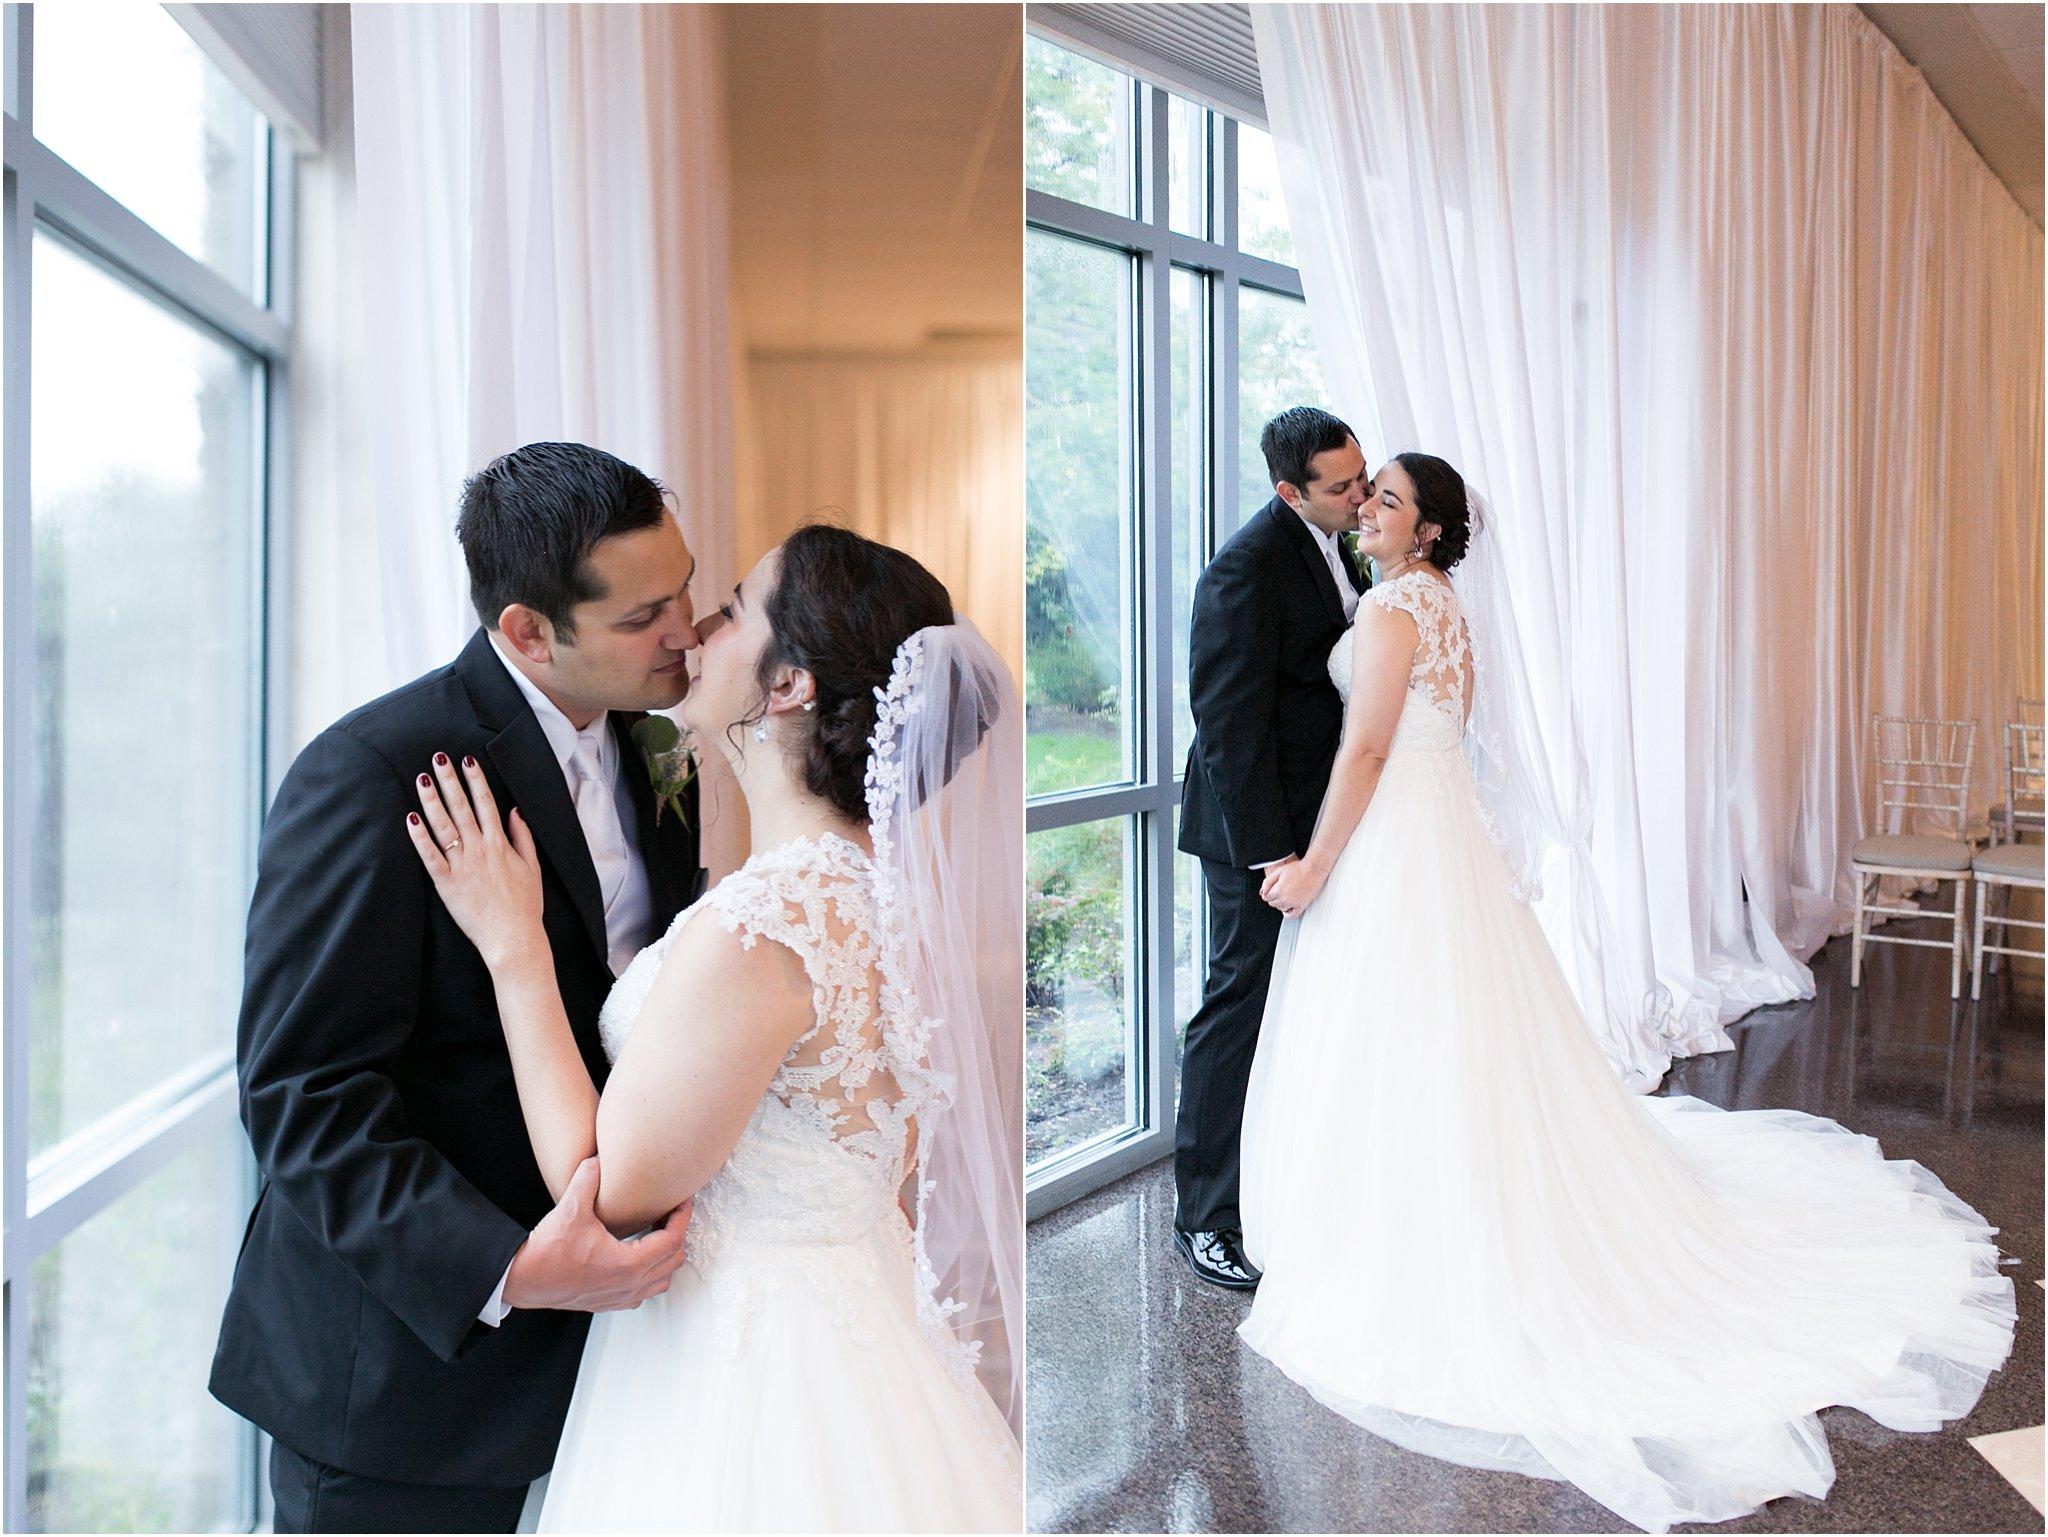 jessica_ryan_photography_virginia_wedding_photographer_wedding_hurricane_norfolk_botanical_gardens_hurricane_matthew_wedding_3570